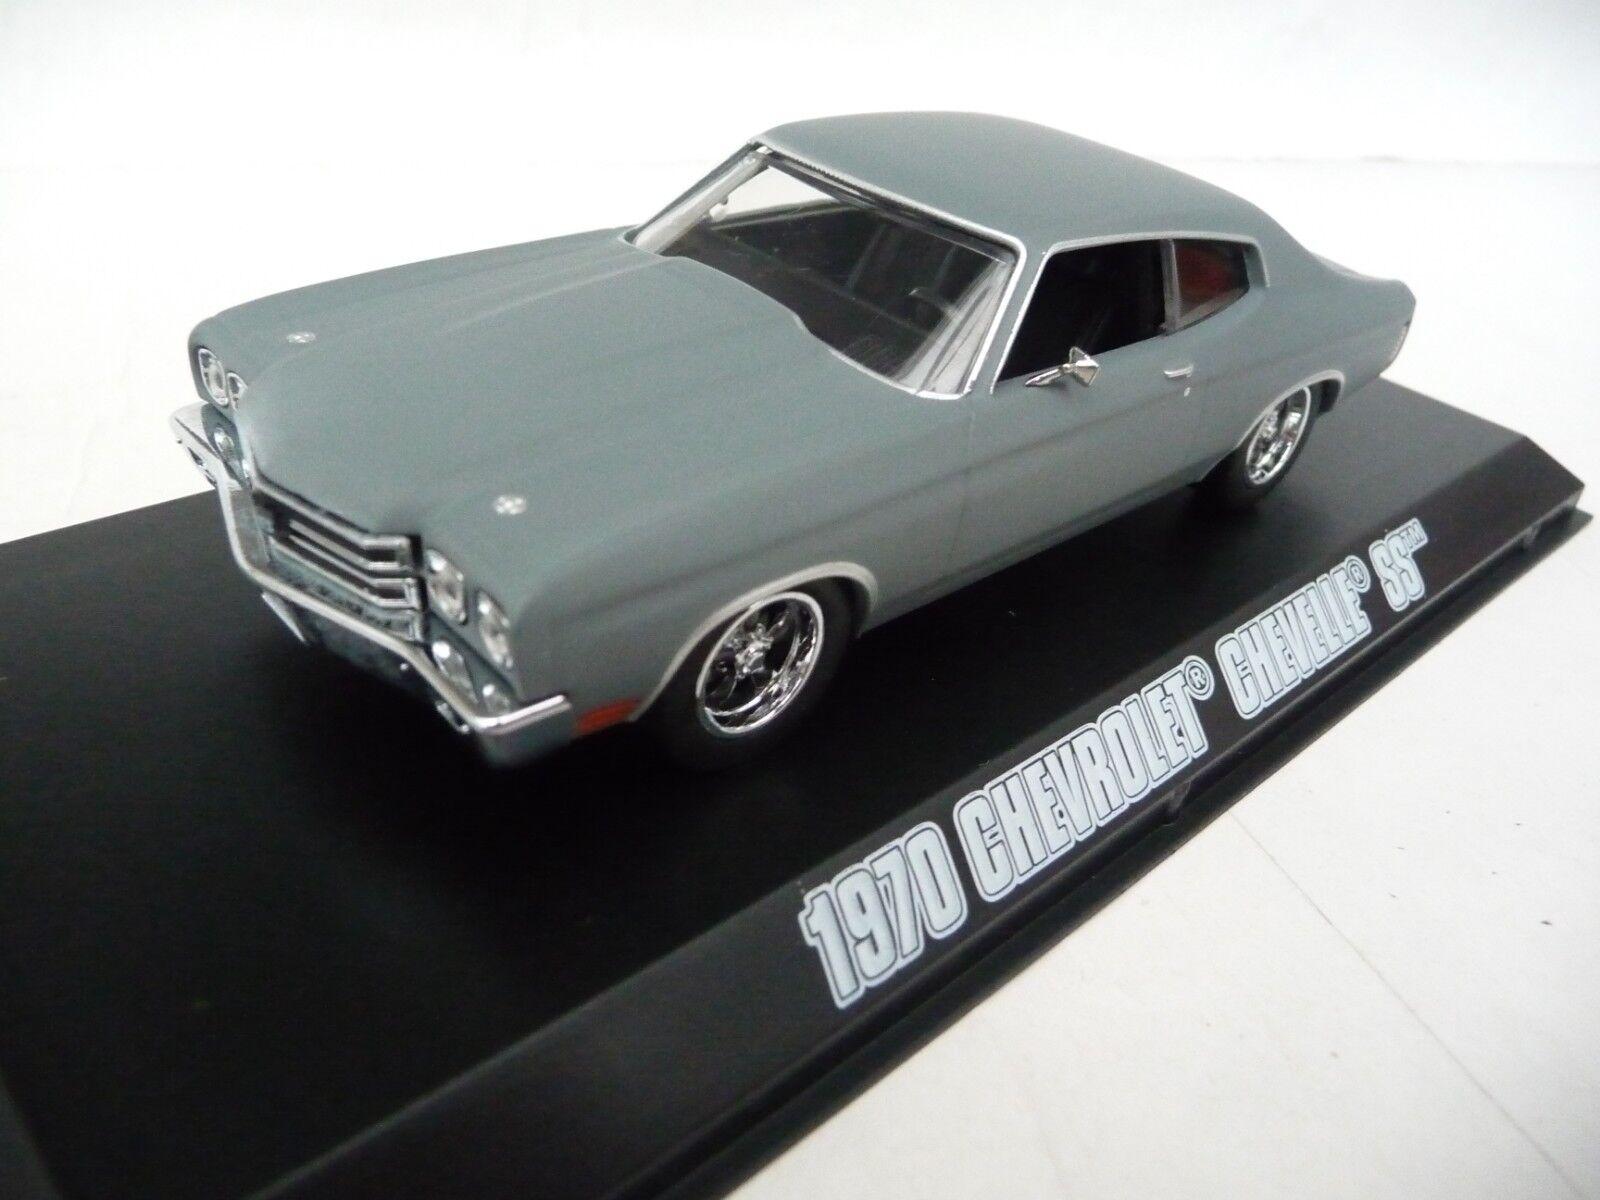 Green Light 1 43 Chevrolet Chevelle SS 1970 Grey Fast & Furious 4 GL86227